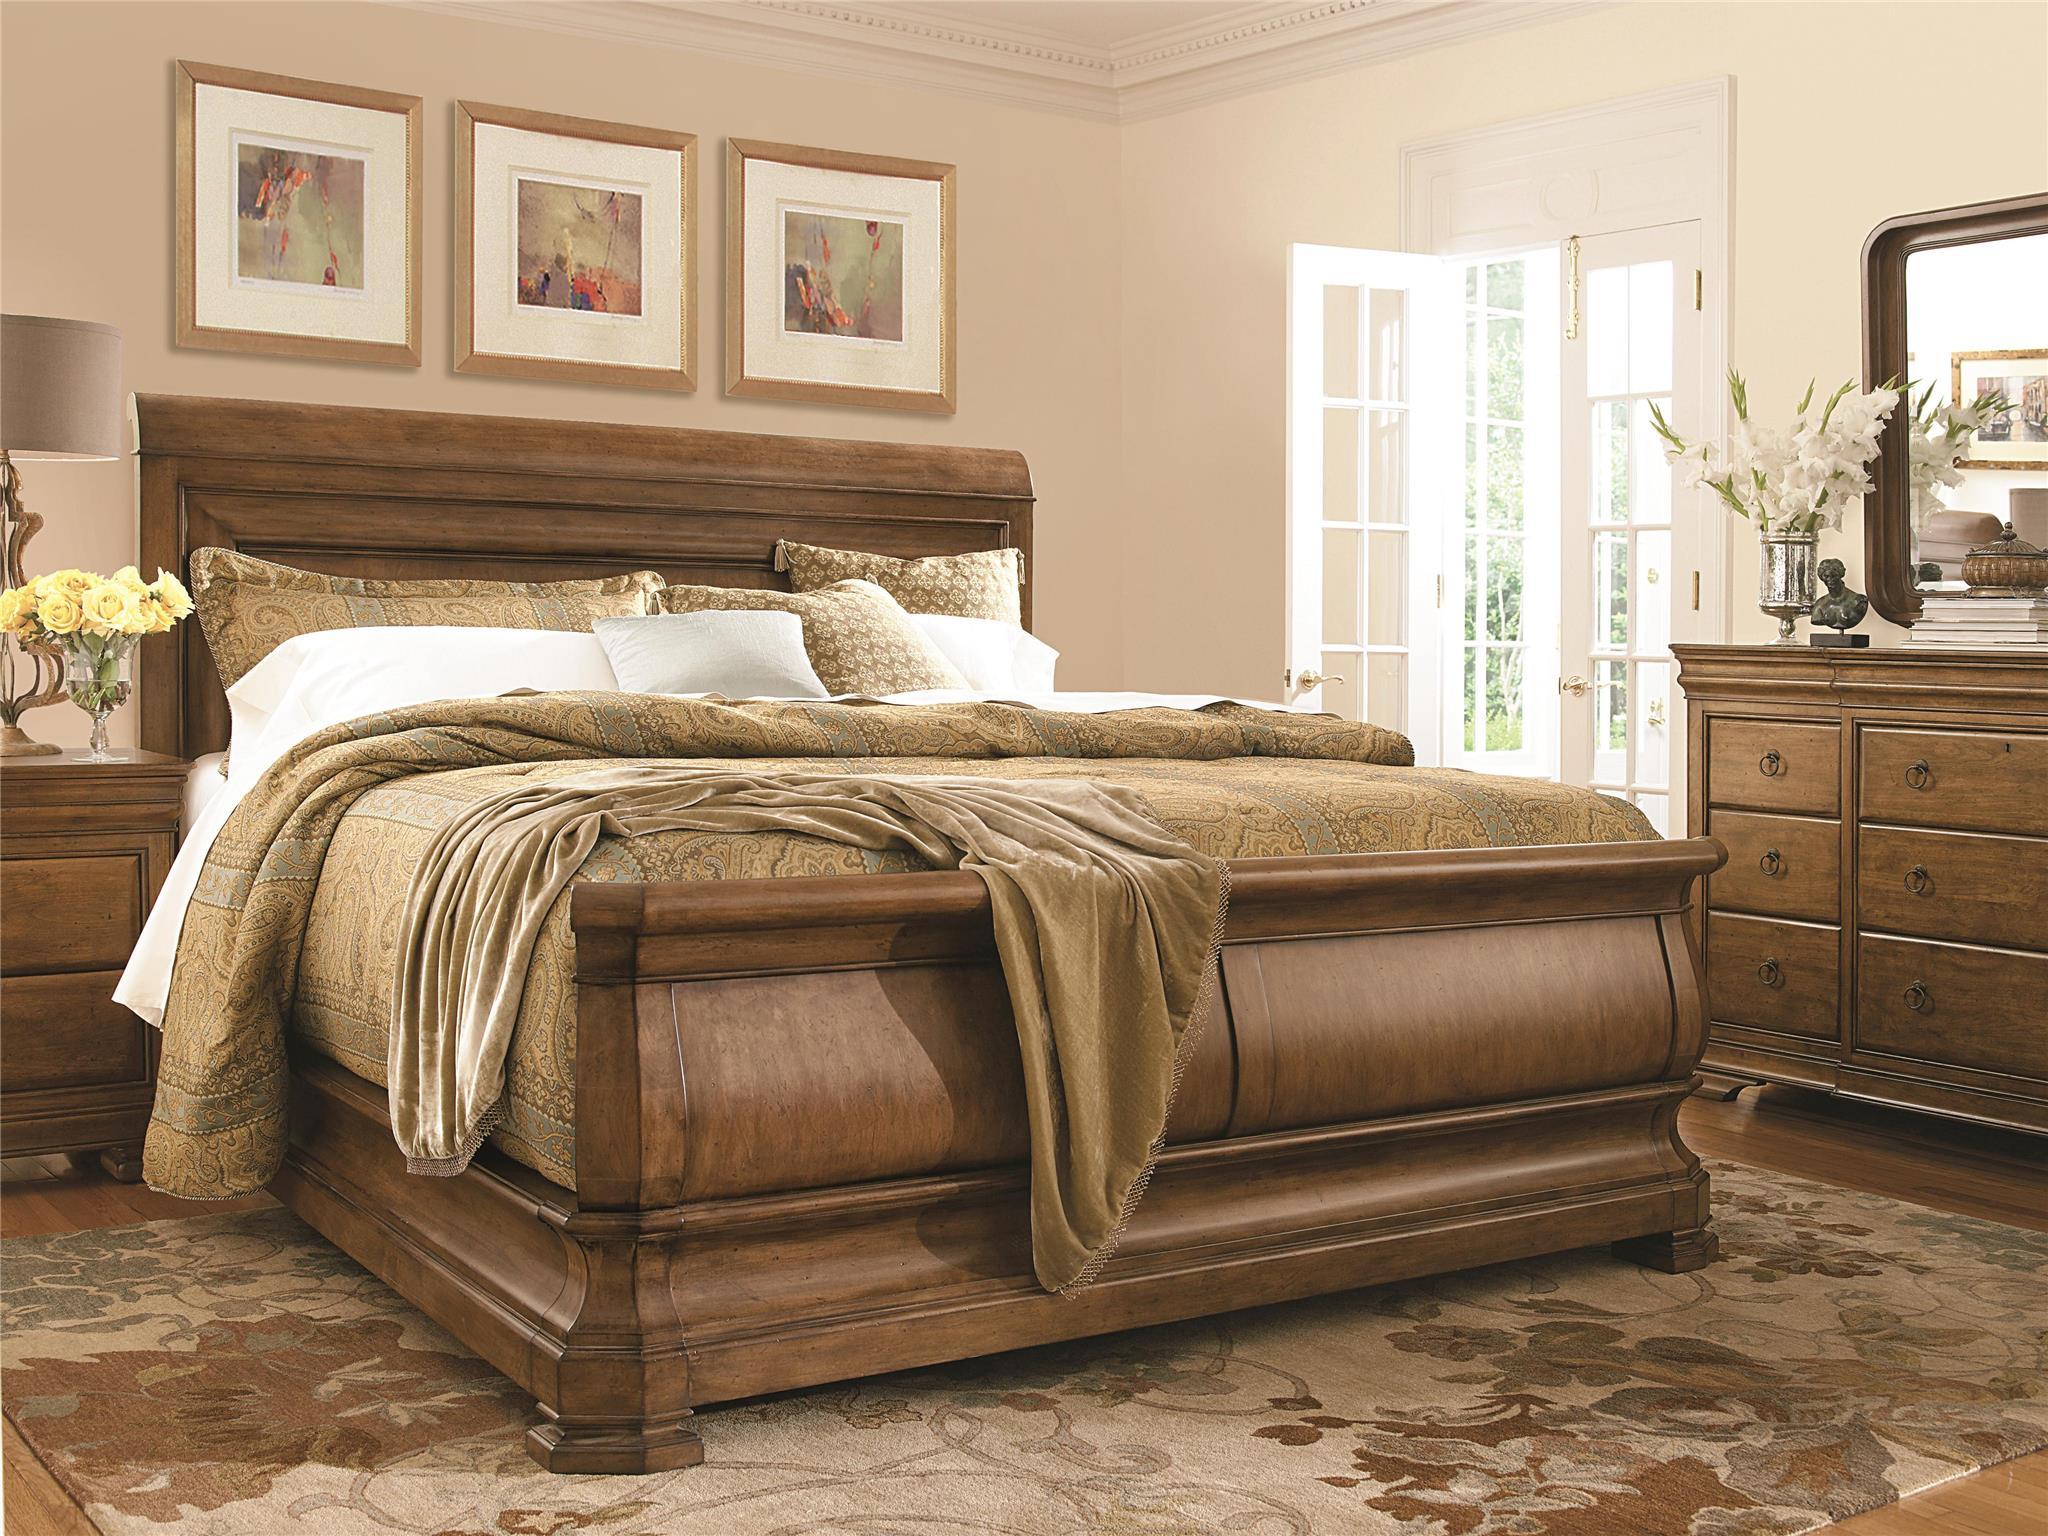 bedroom sanders furniture company winder georgia